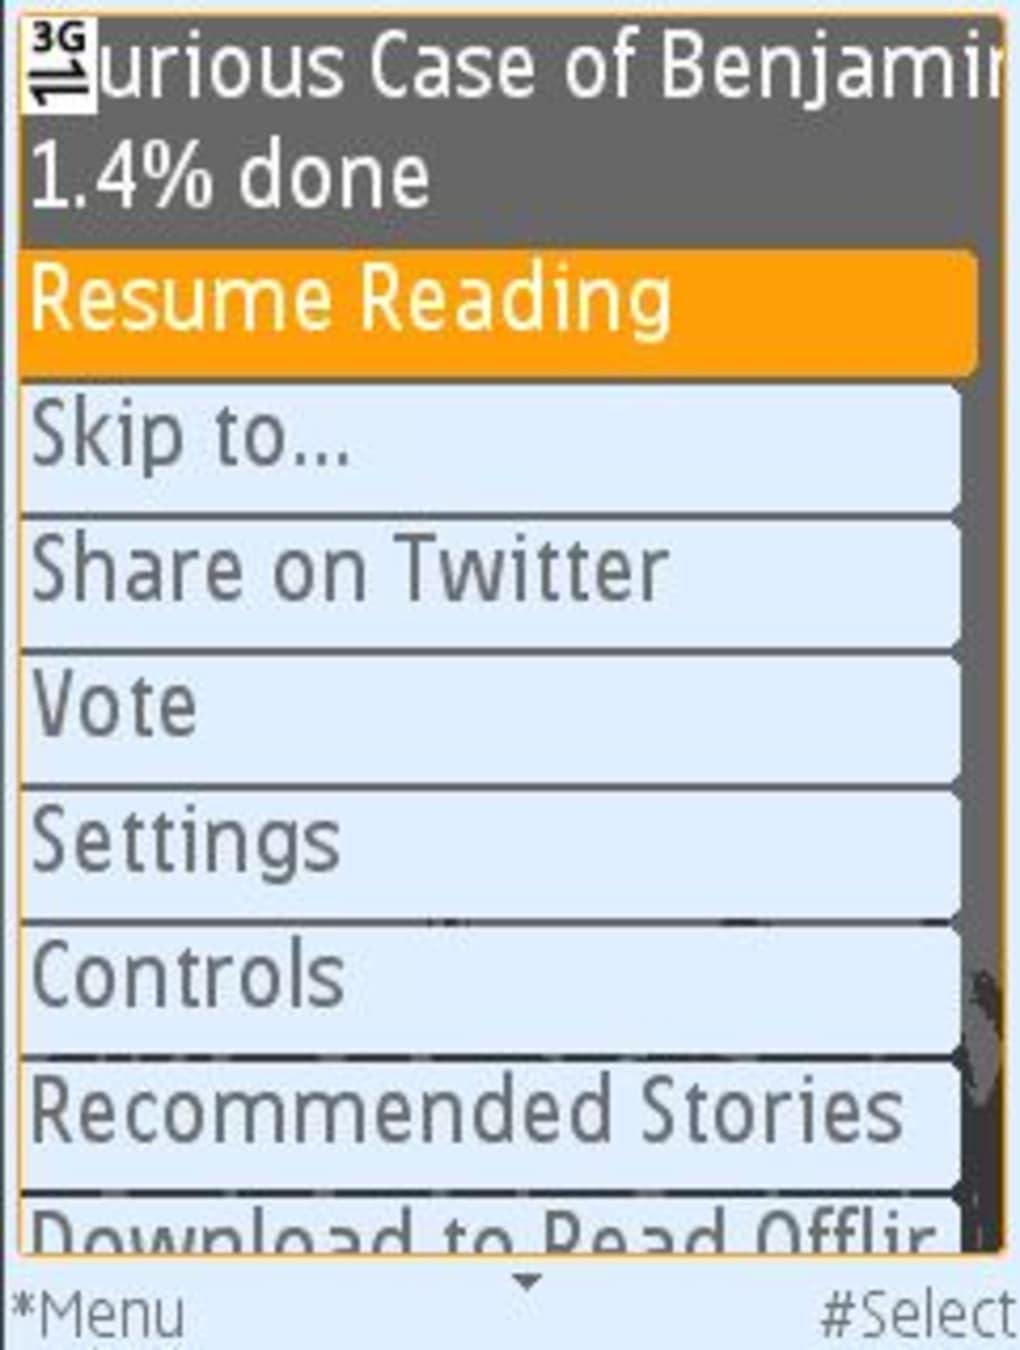 Nokia ebook reader download free for 2690